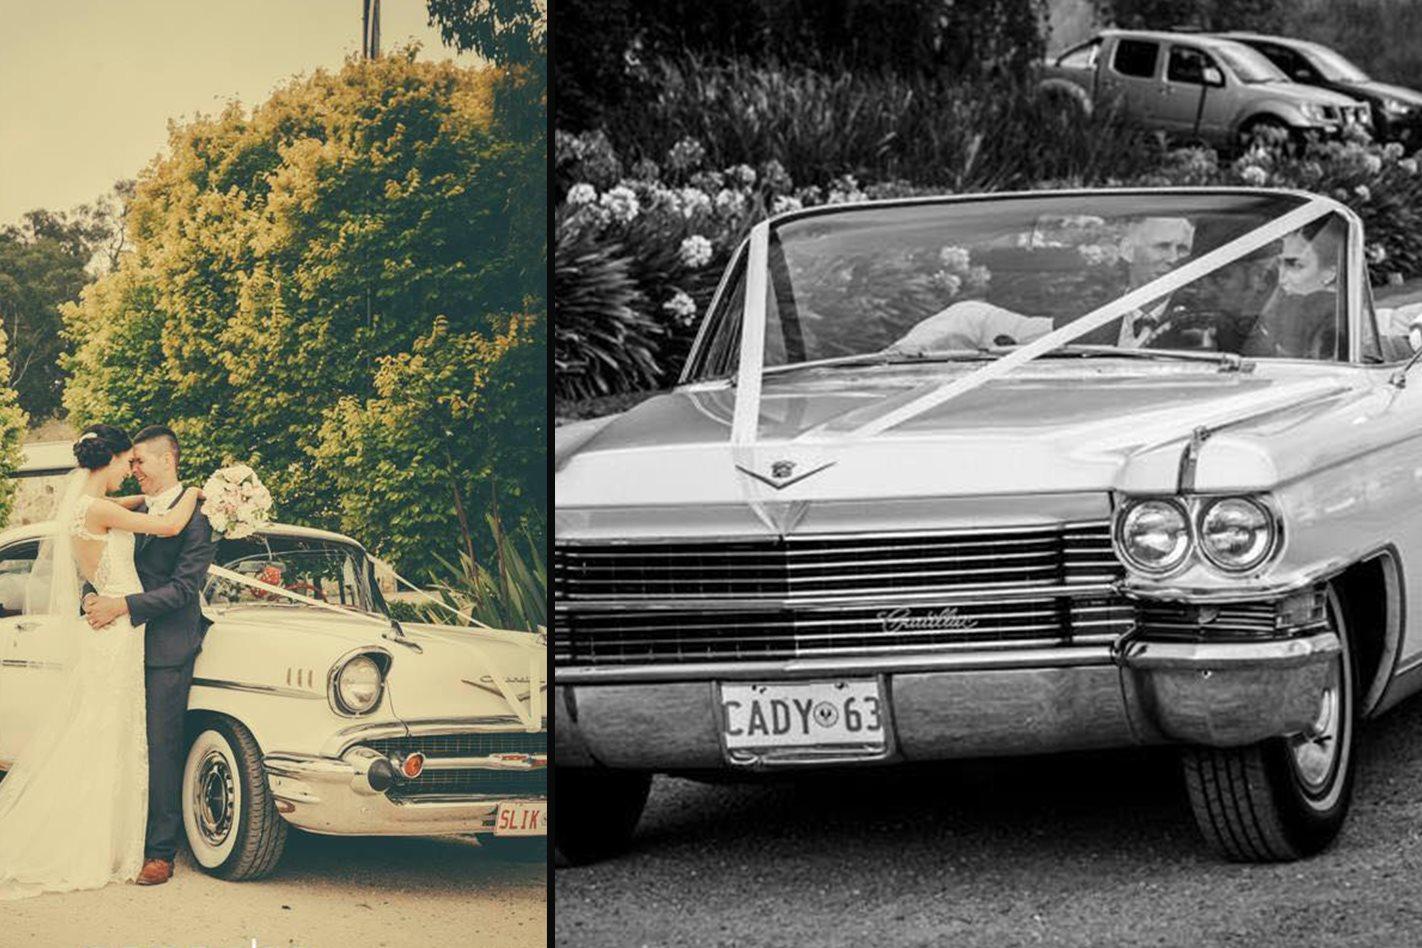 Adam Redel's wedding cars